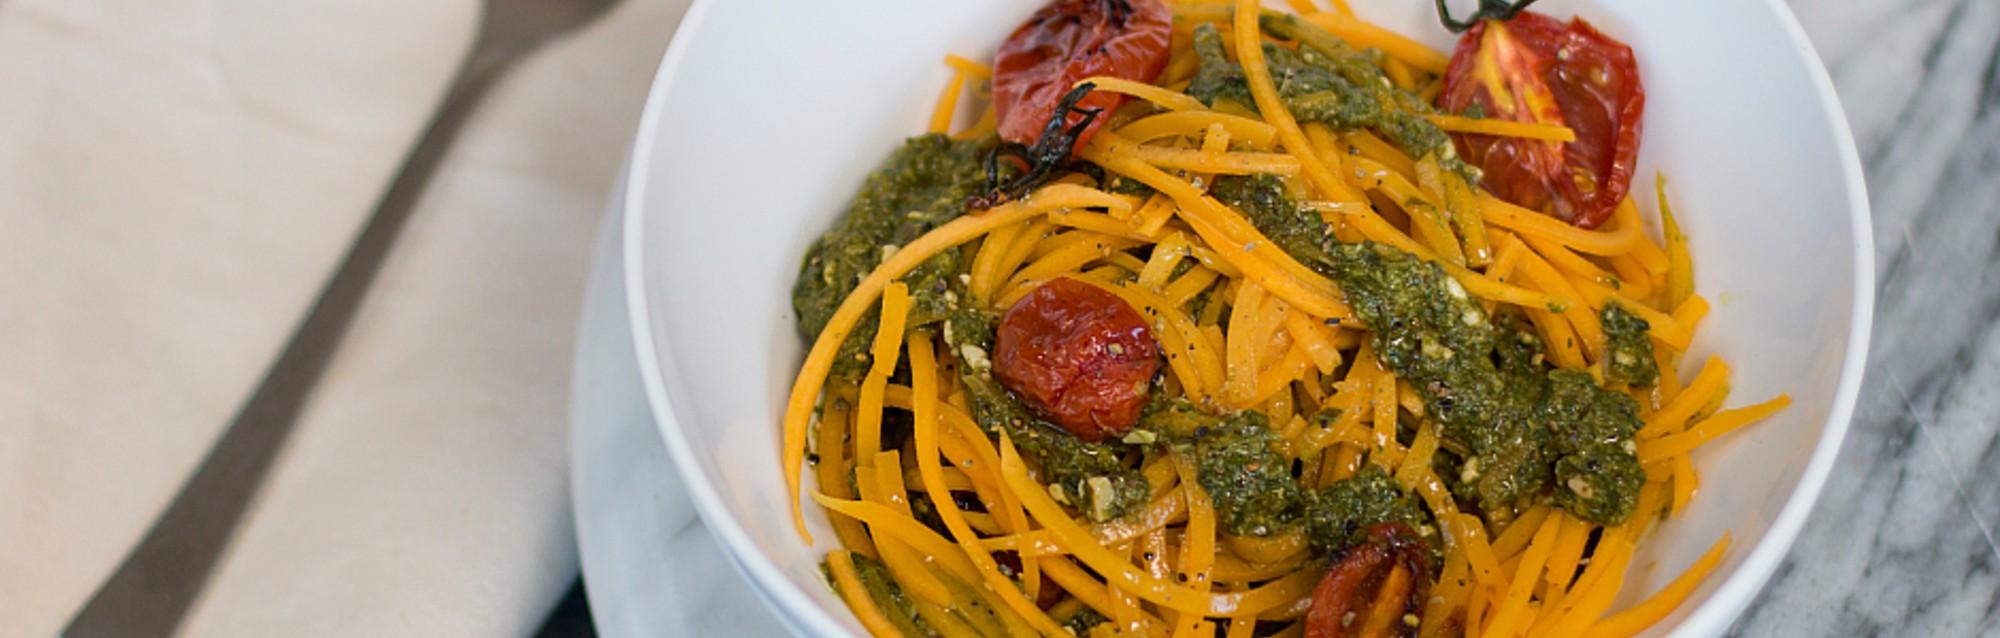 Pure South Press Avocado Oil Pesto Recipe